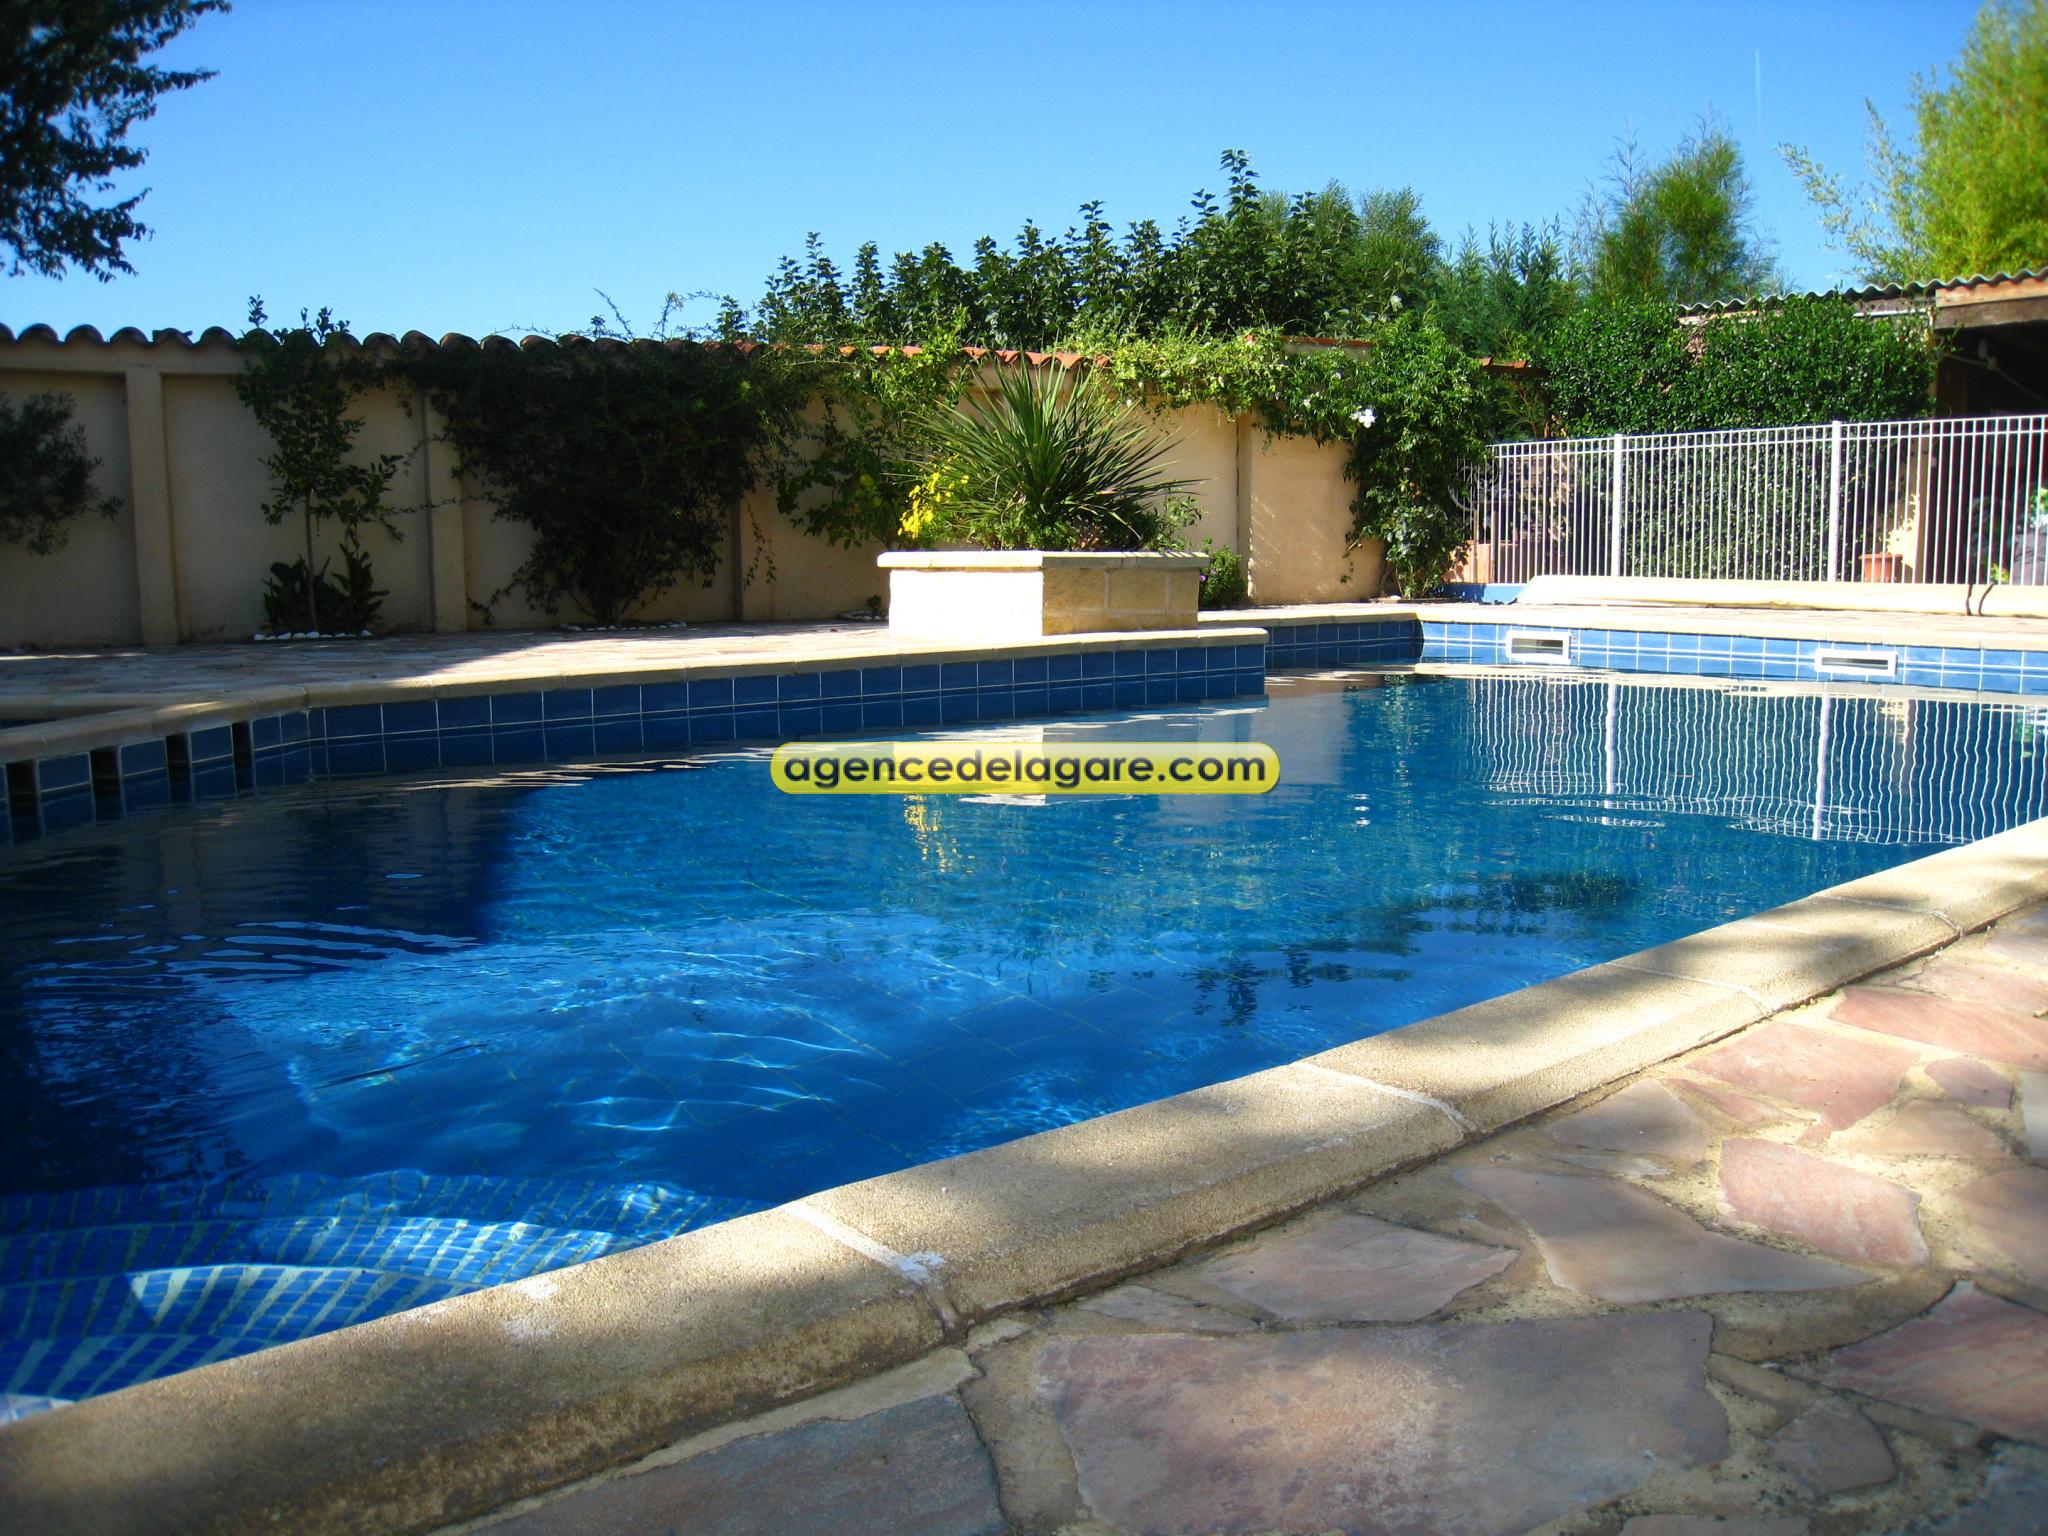 Vue piscine / www.agencedelagare.com